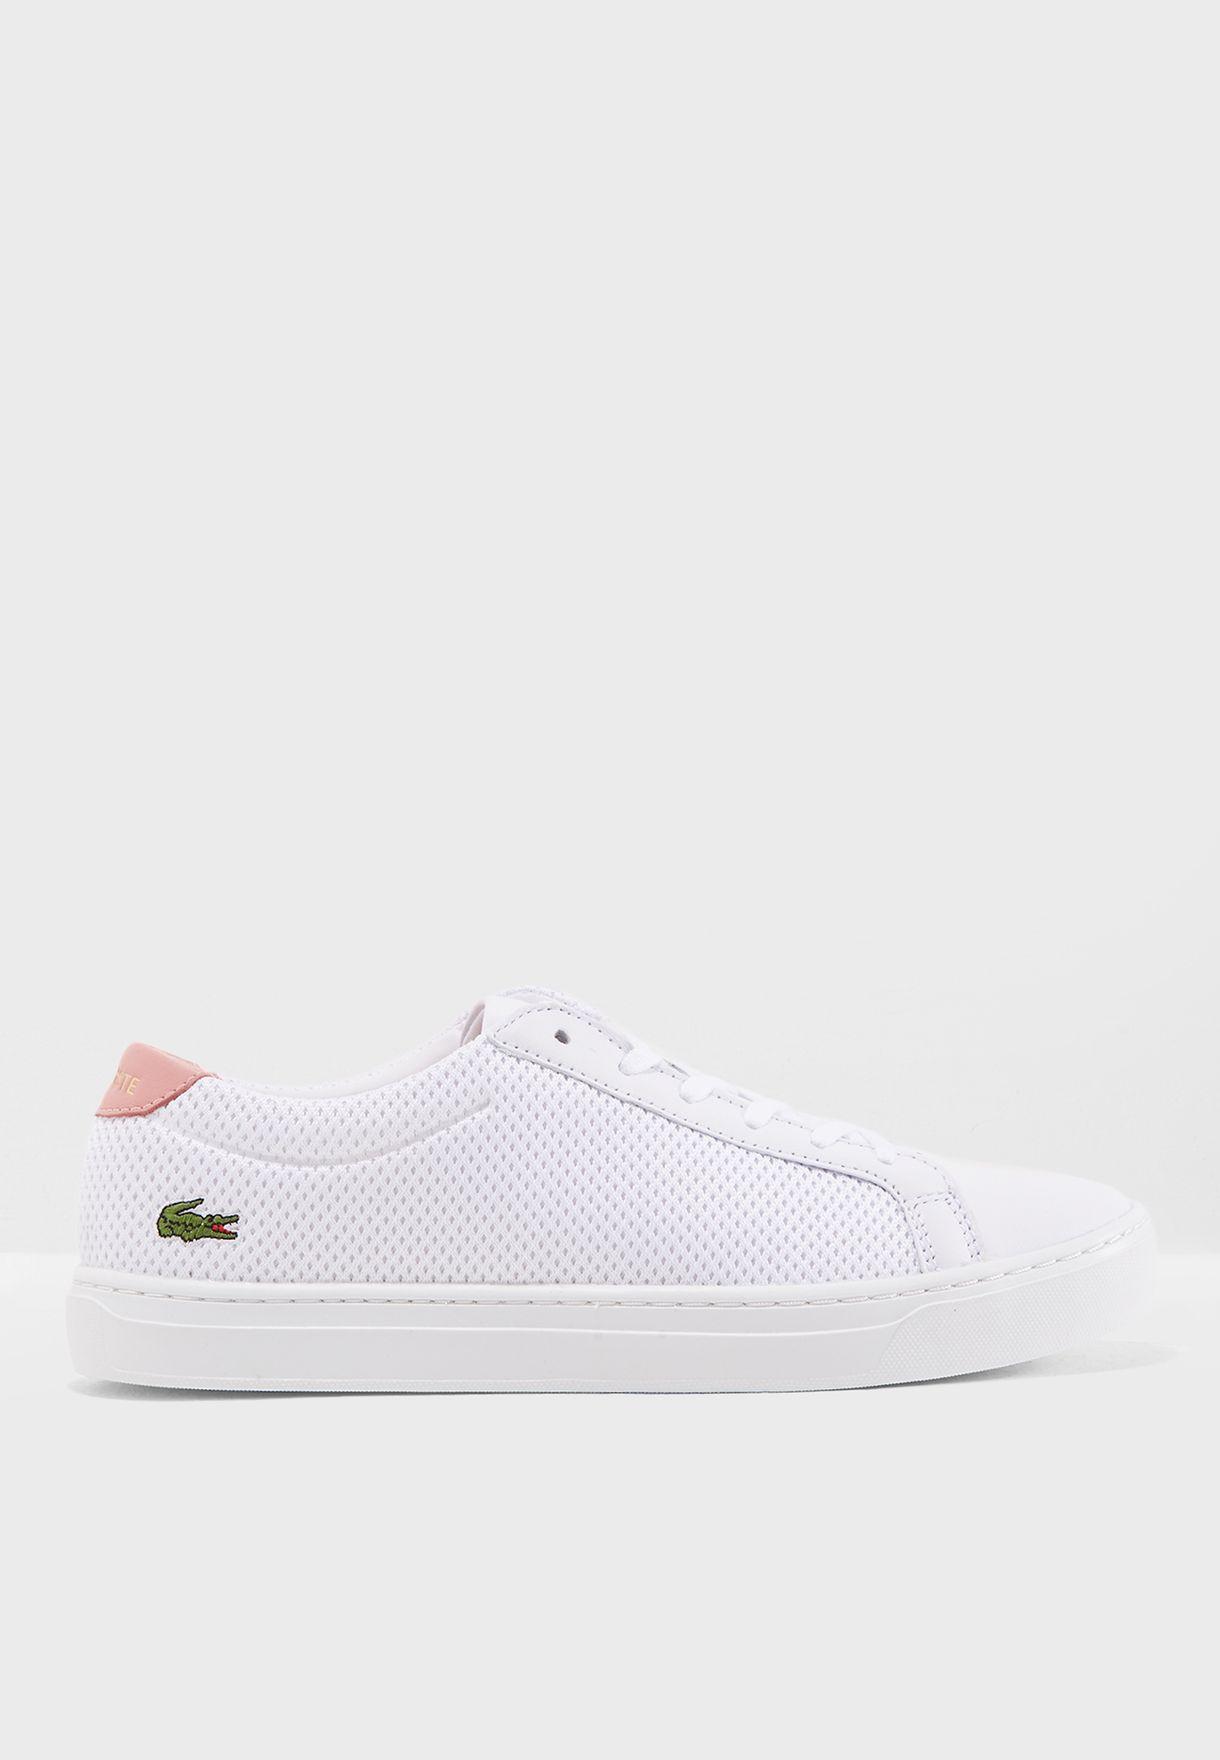 6d07230ea Shop Lacoste white L.12.12 Light-Wt 3182 Caw Sneaker 736CAW0018 for ...